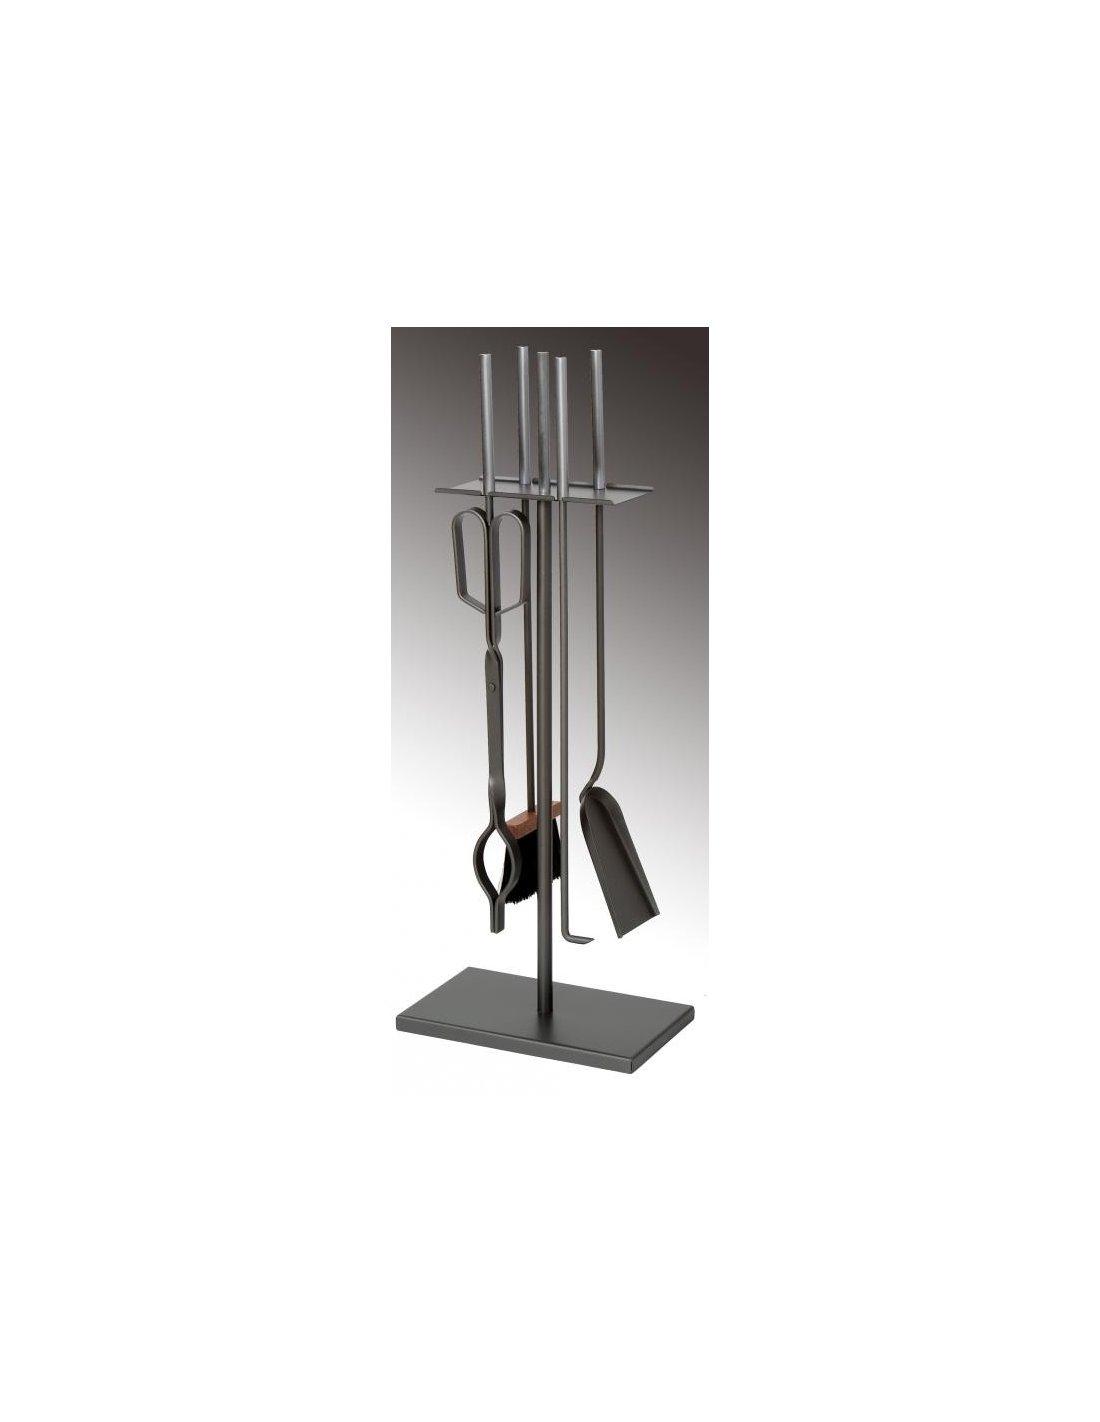 Accesorios para chimeneas airea condicionado - Accesorios de chimeneas ...